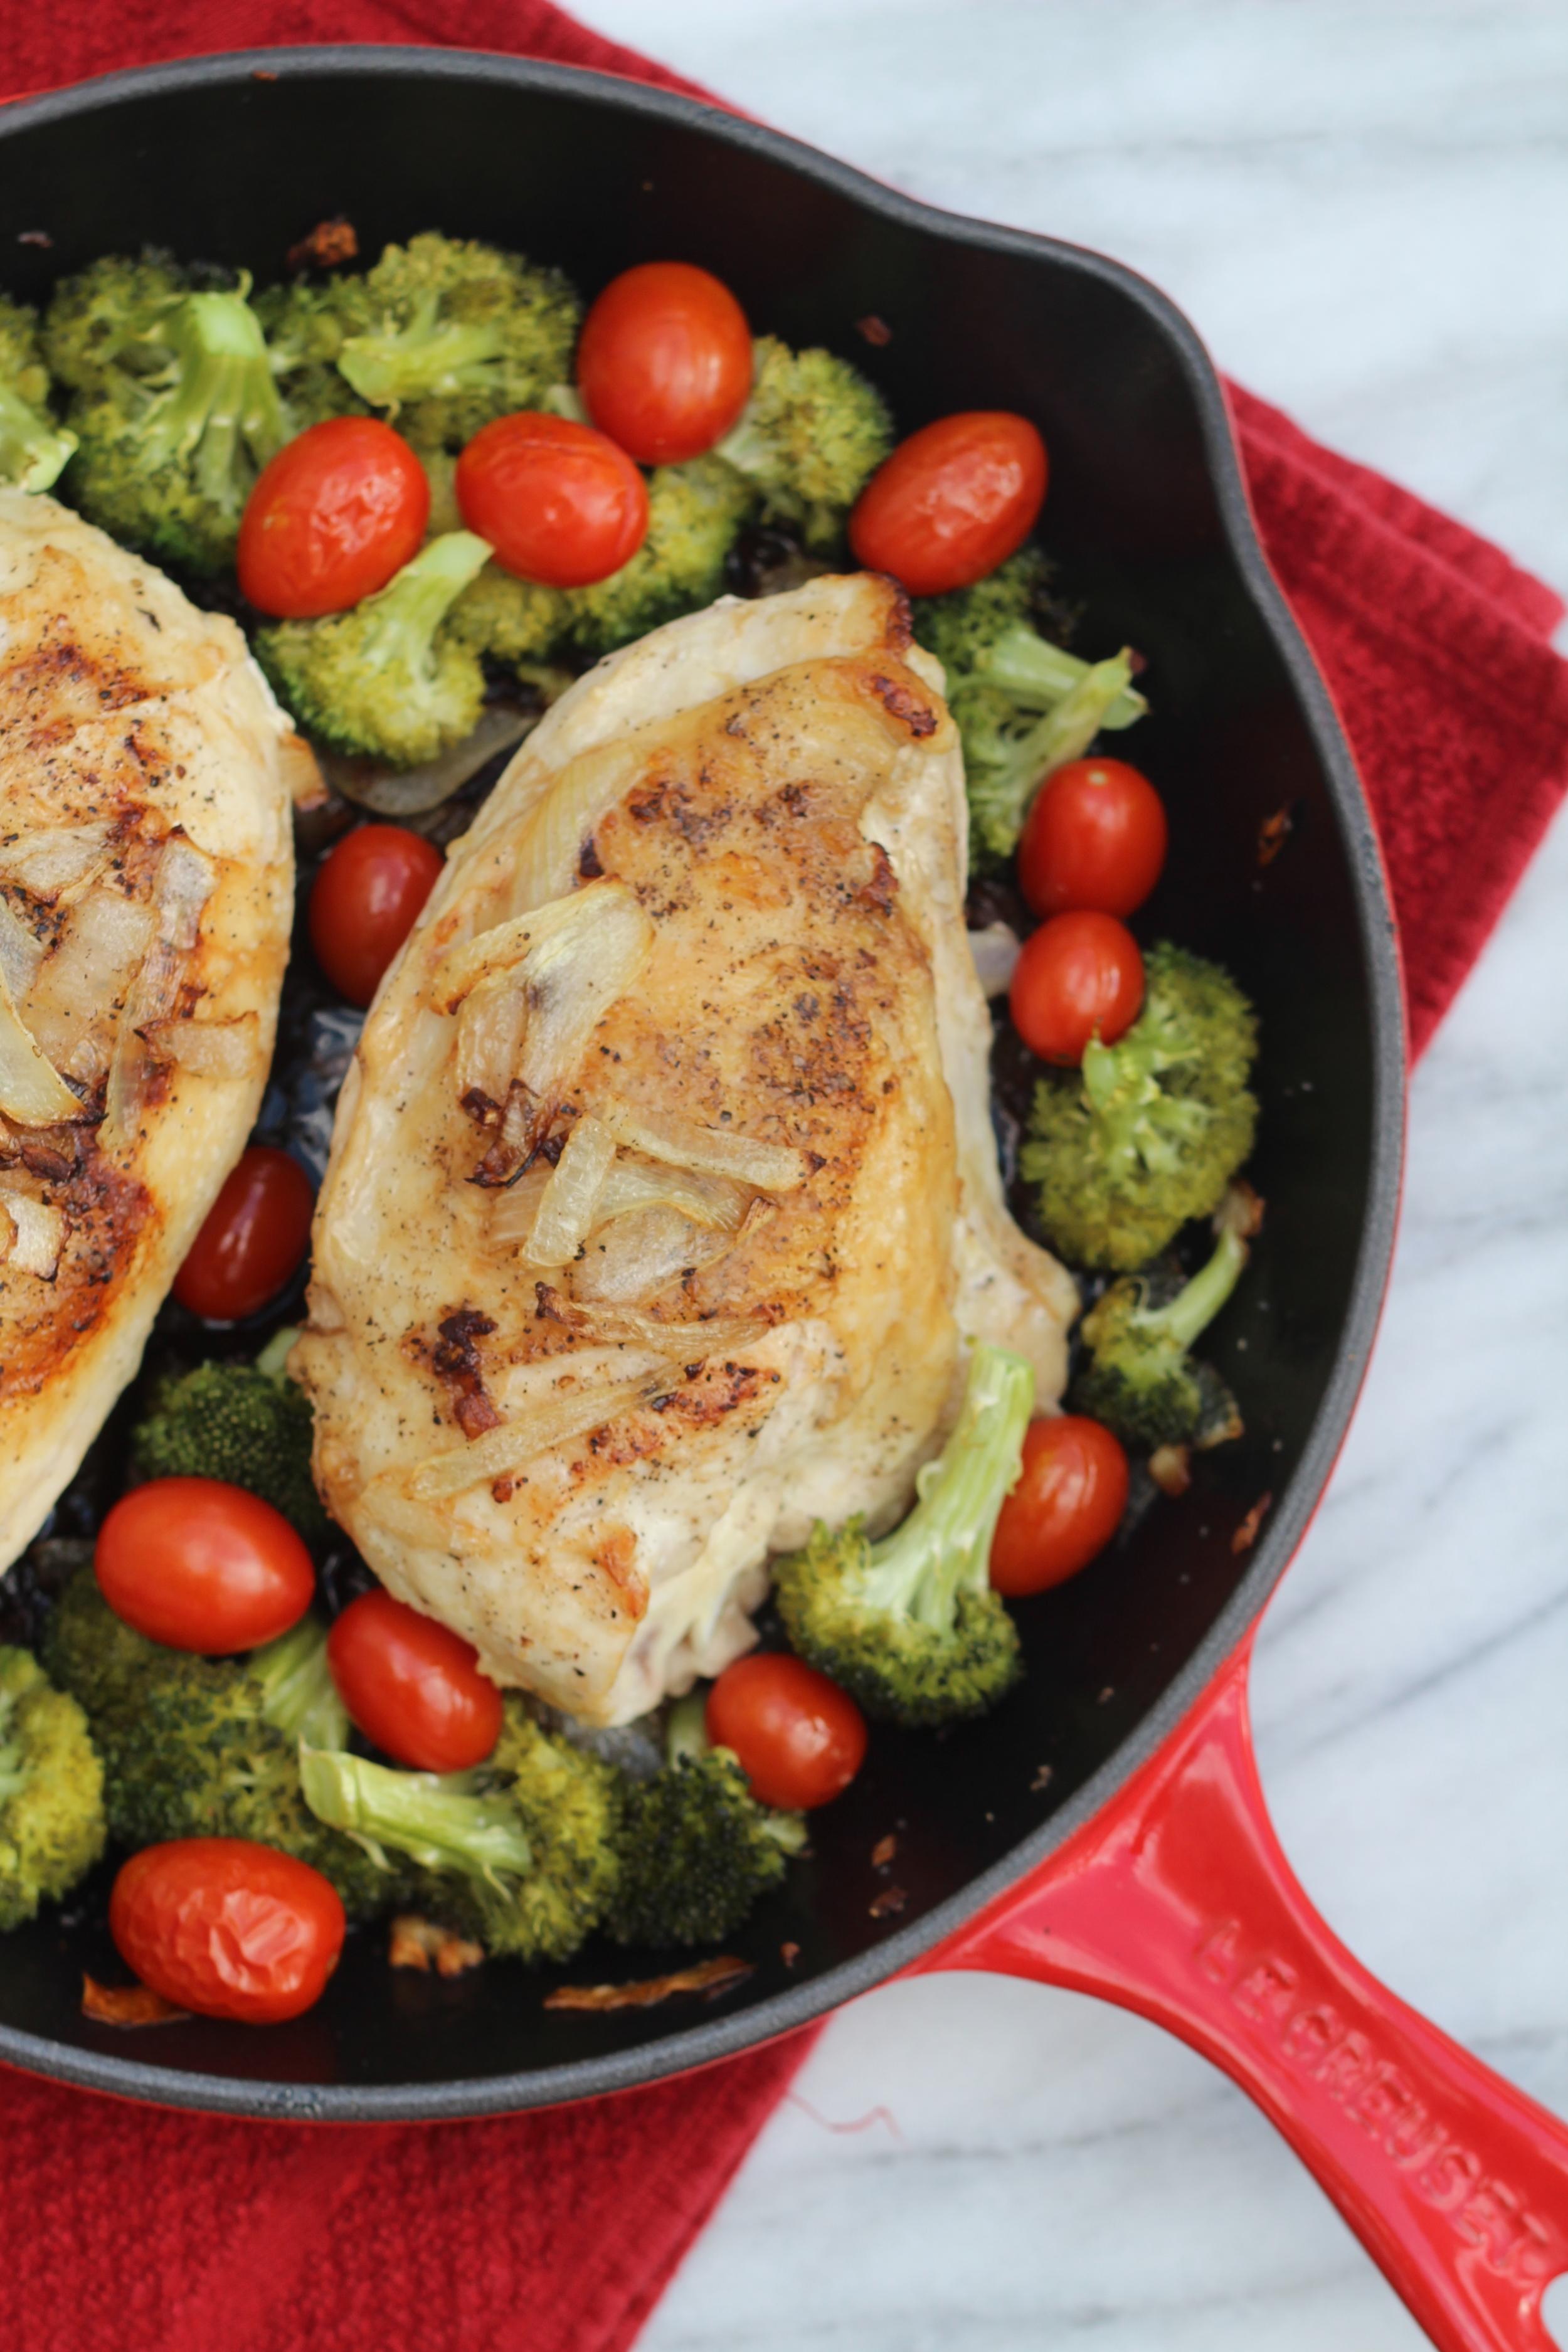 Easy One-Pot Paleo Chicken Dinner